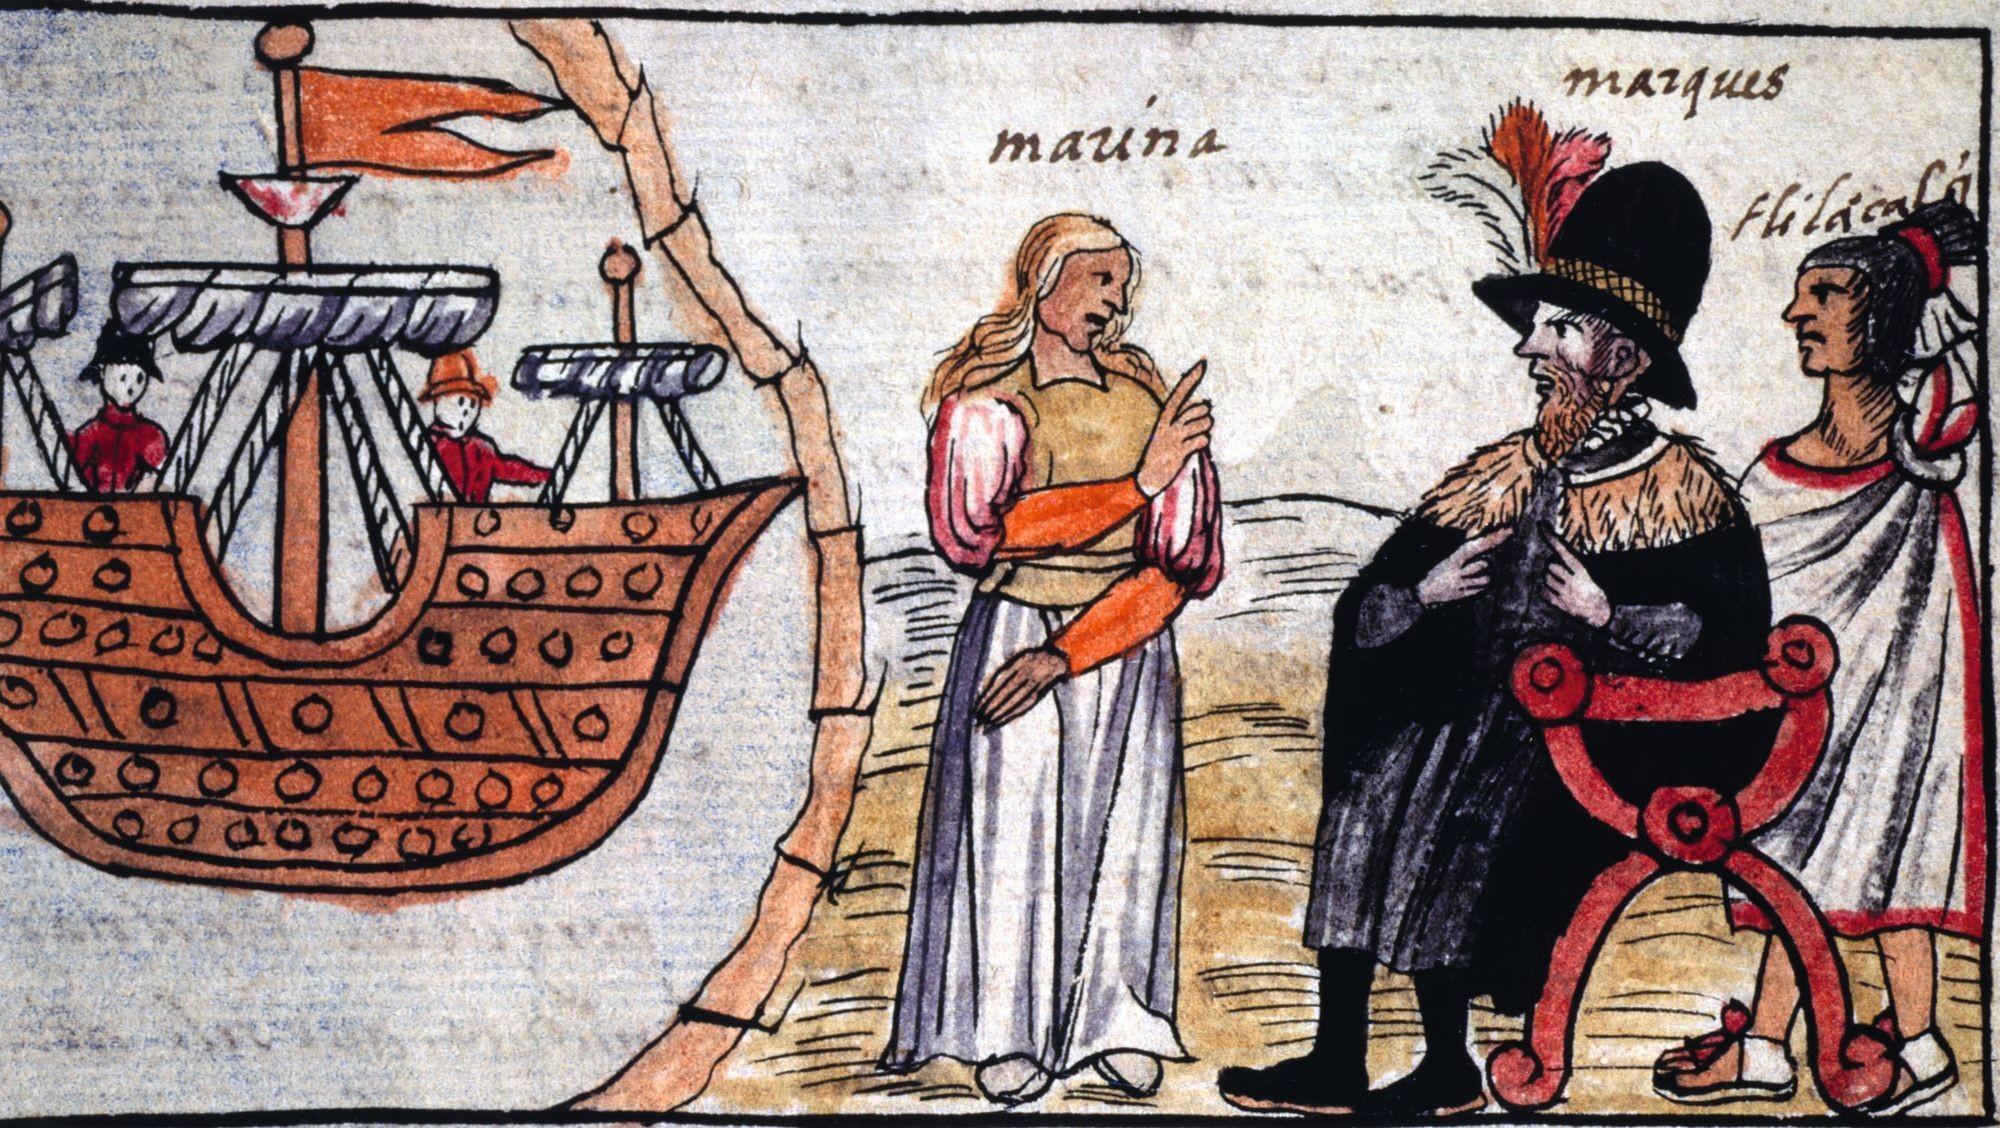 La Malinche (Marina) traduit à Cortès ce que lui dit l'émissaire de Moctezuma, Codex Duràn, 1581, gravure, 55,9 x 31,5 cm, Biblioteca National, Madrid